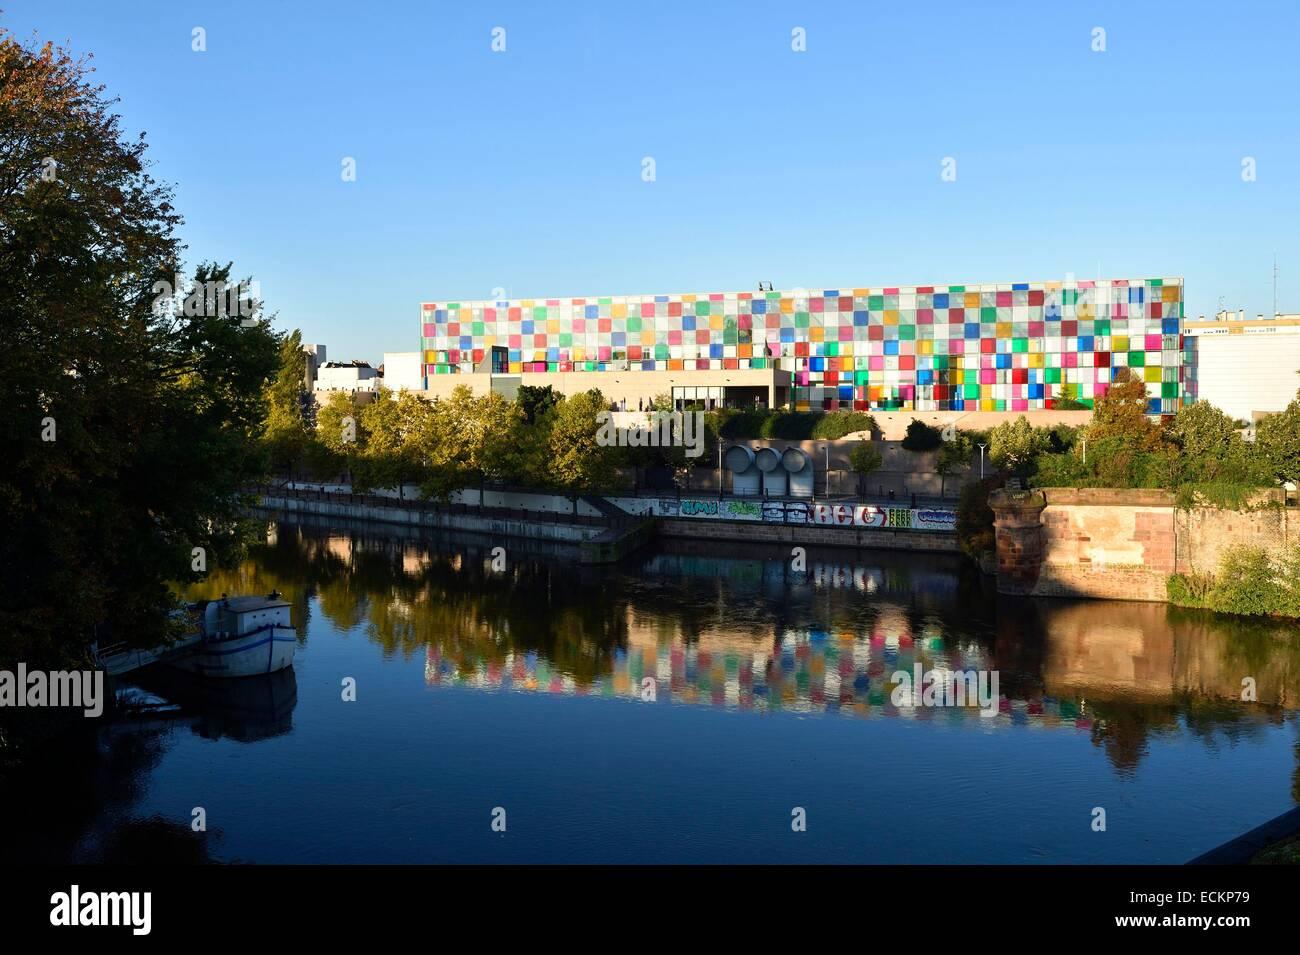 France bas rhin strasbourg musee d 39 art moderne et contemporain de stock photo royalty free - Musee d art moderne et contemporain de strasbourg ...